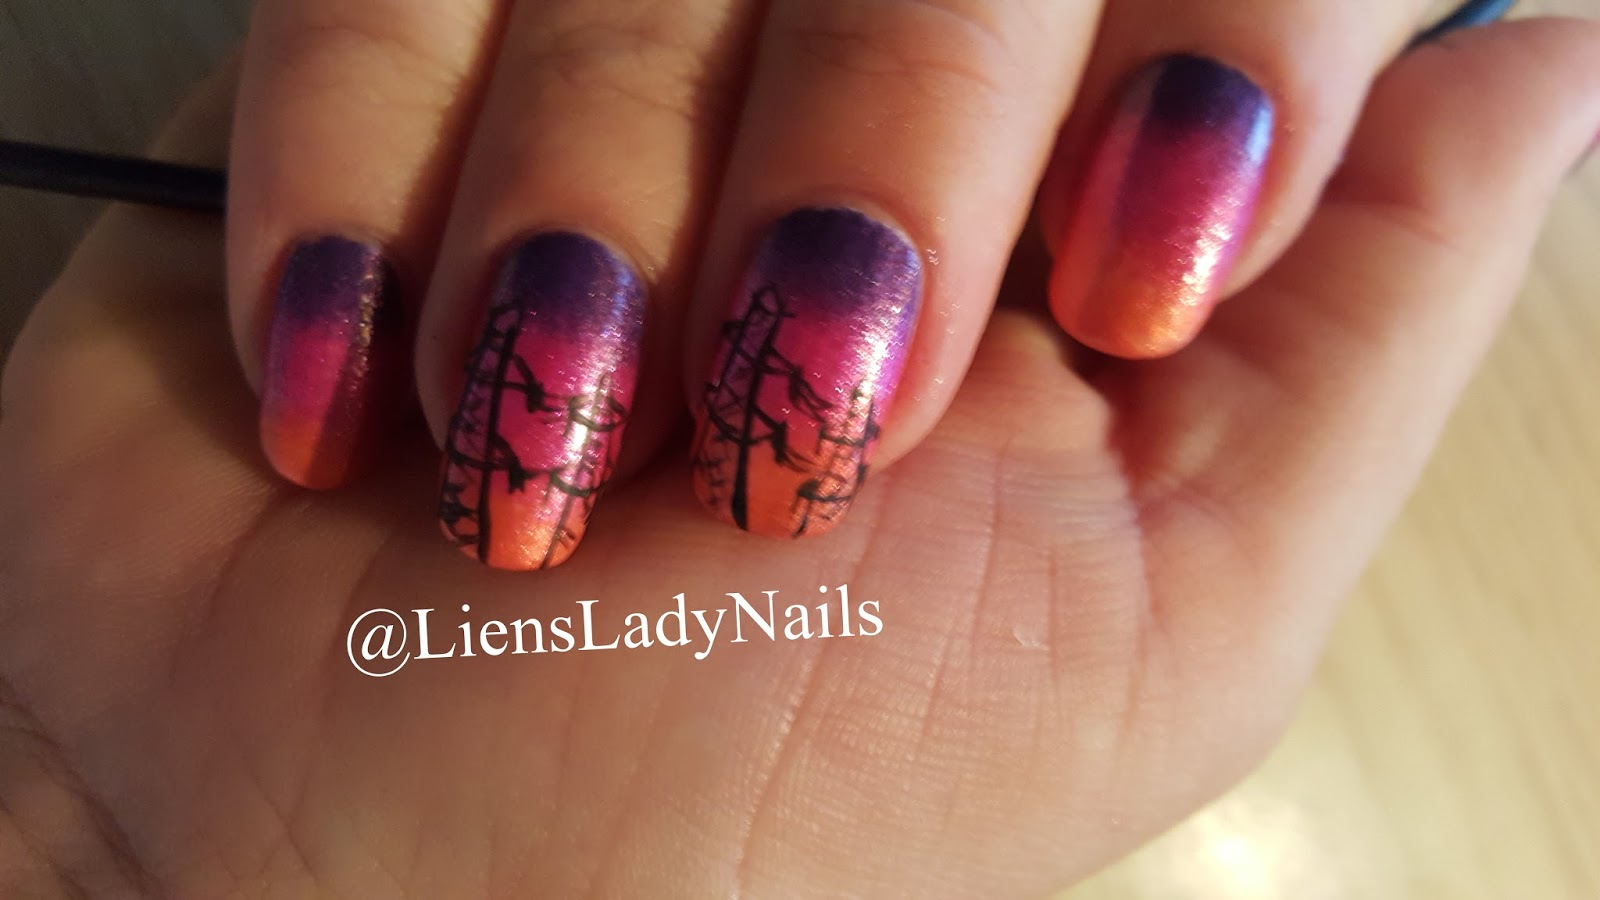 MoreLiensLadyNails: Electricity nail art